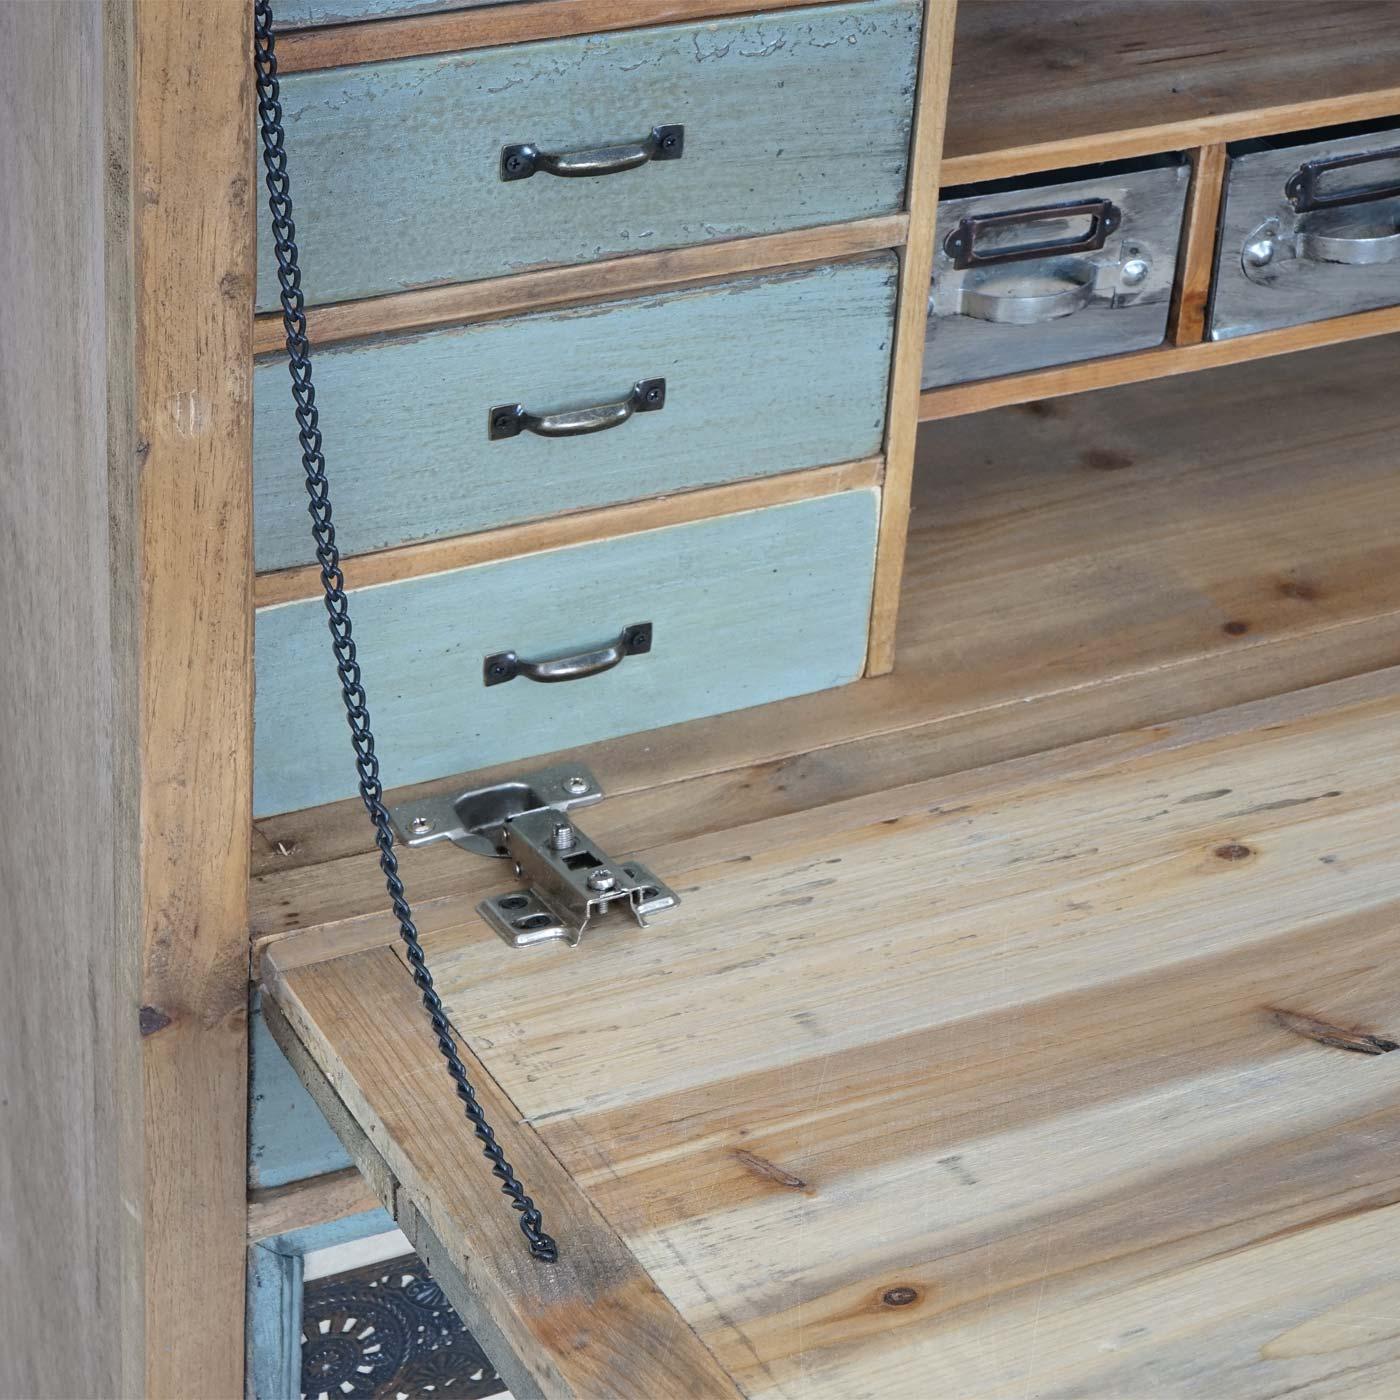 Sekretar Hwc A43 Kommode Schrank Tanne Holz Massiv Vintage